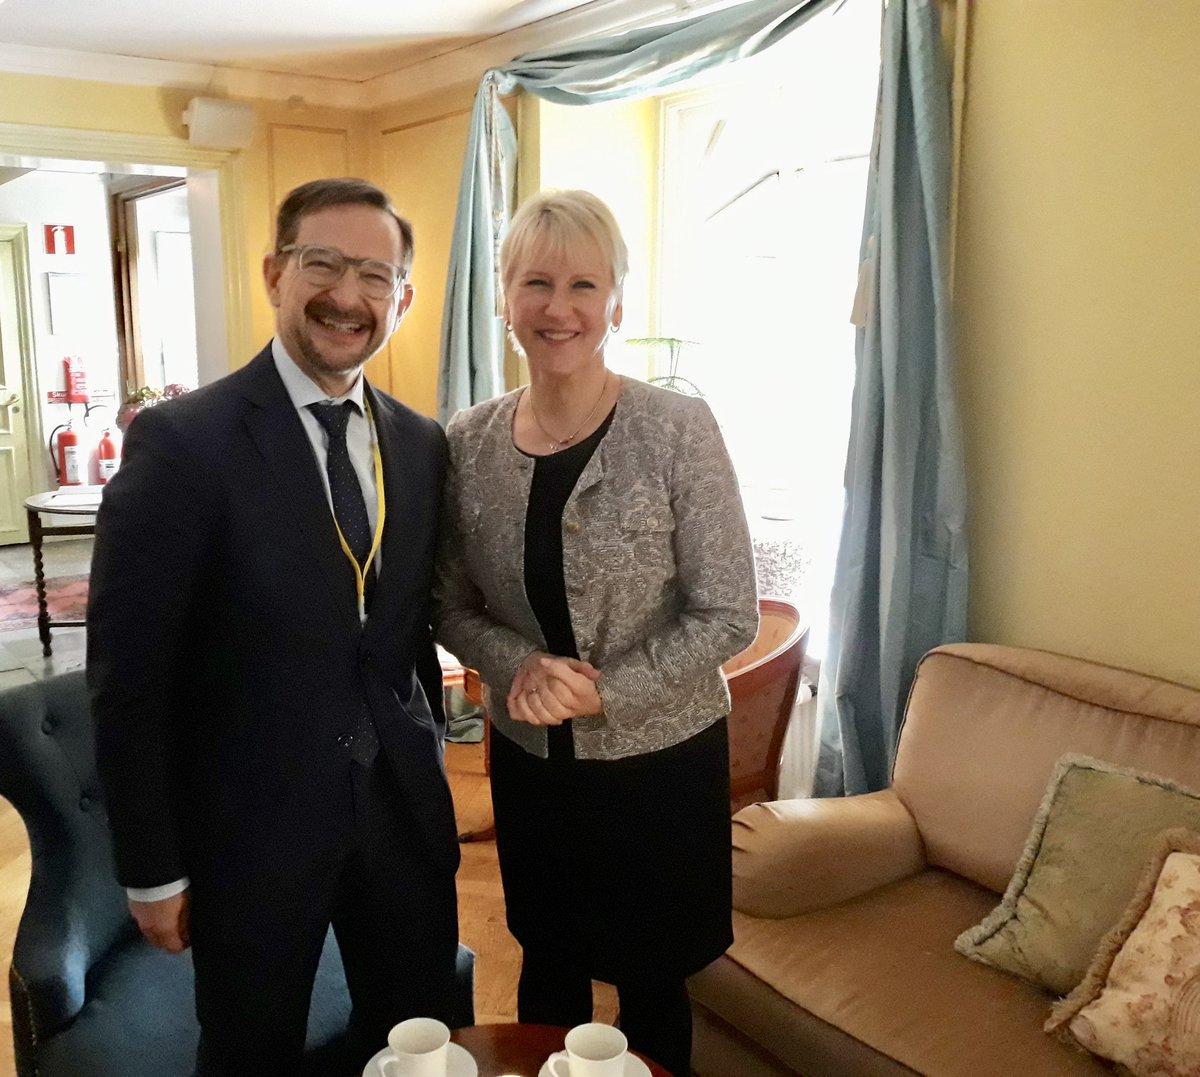 osce swedish mfa and sweden to the osce - Susan Link Lebenslauf